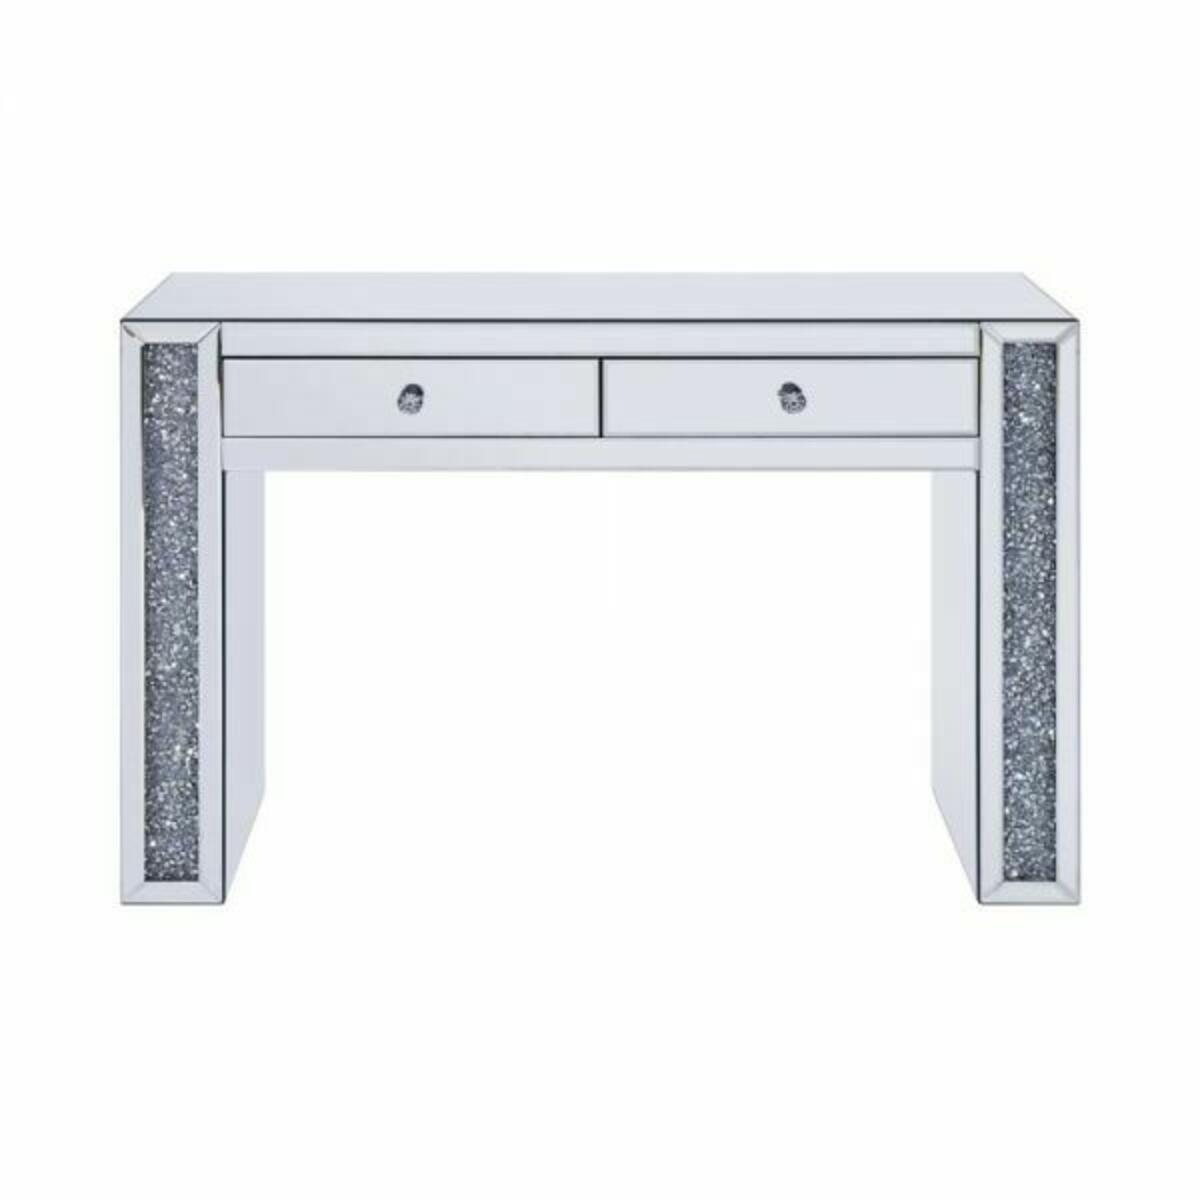 ACME Noralie Vanity Desk - 90465 - Mirrored & Faux Diamonds